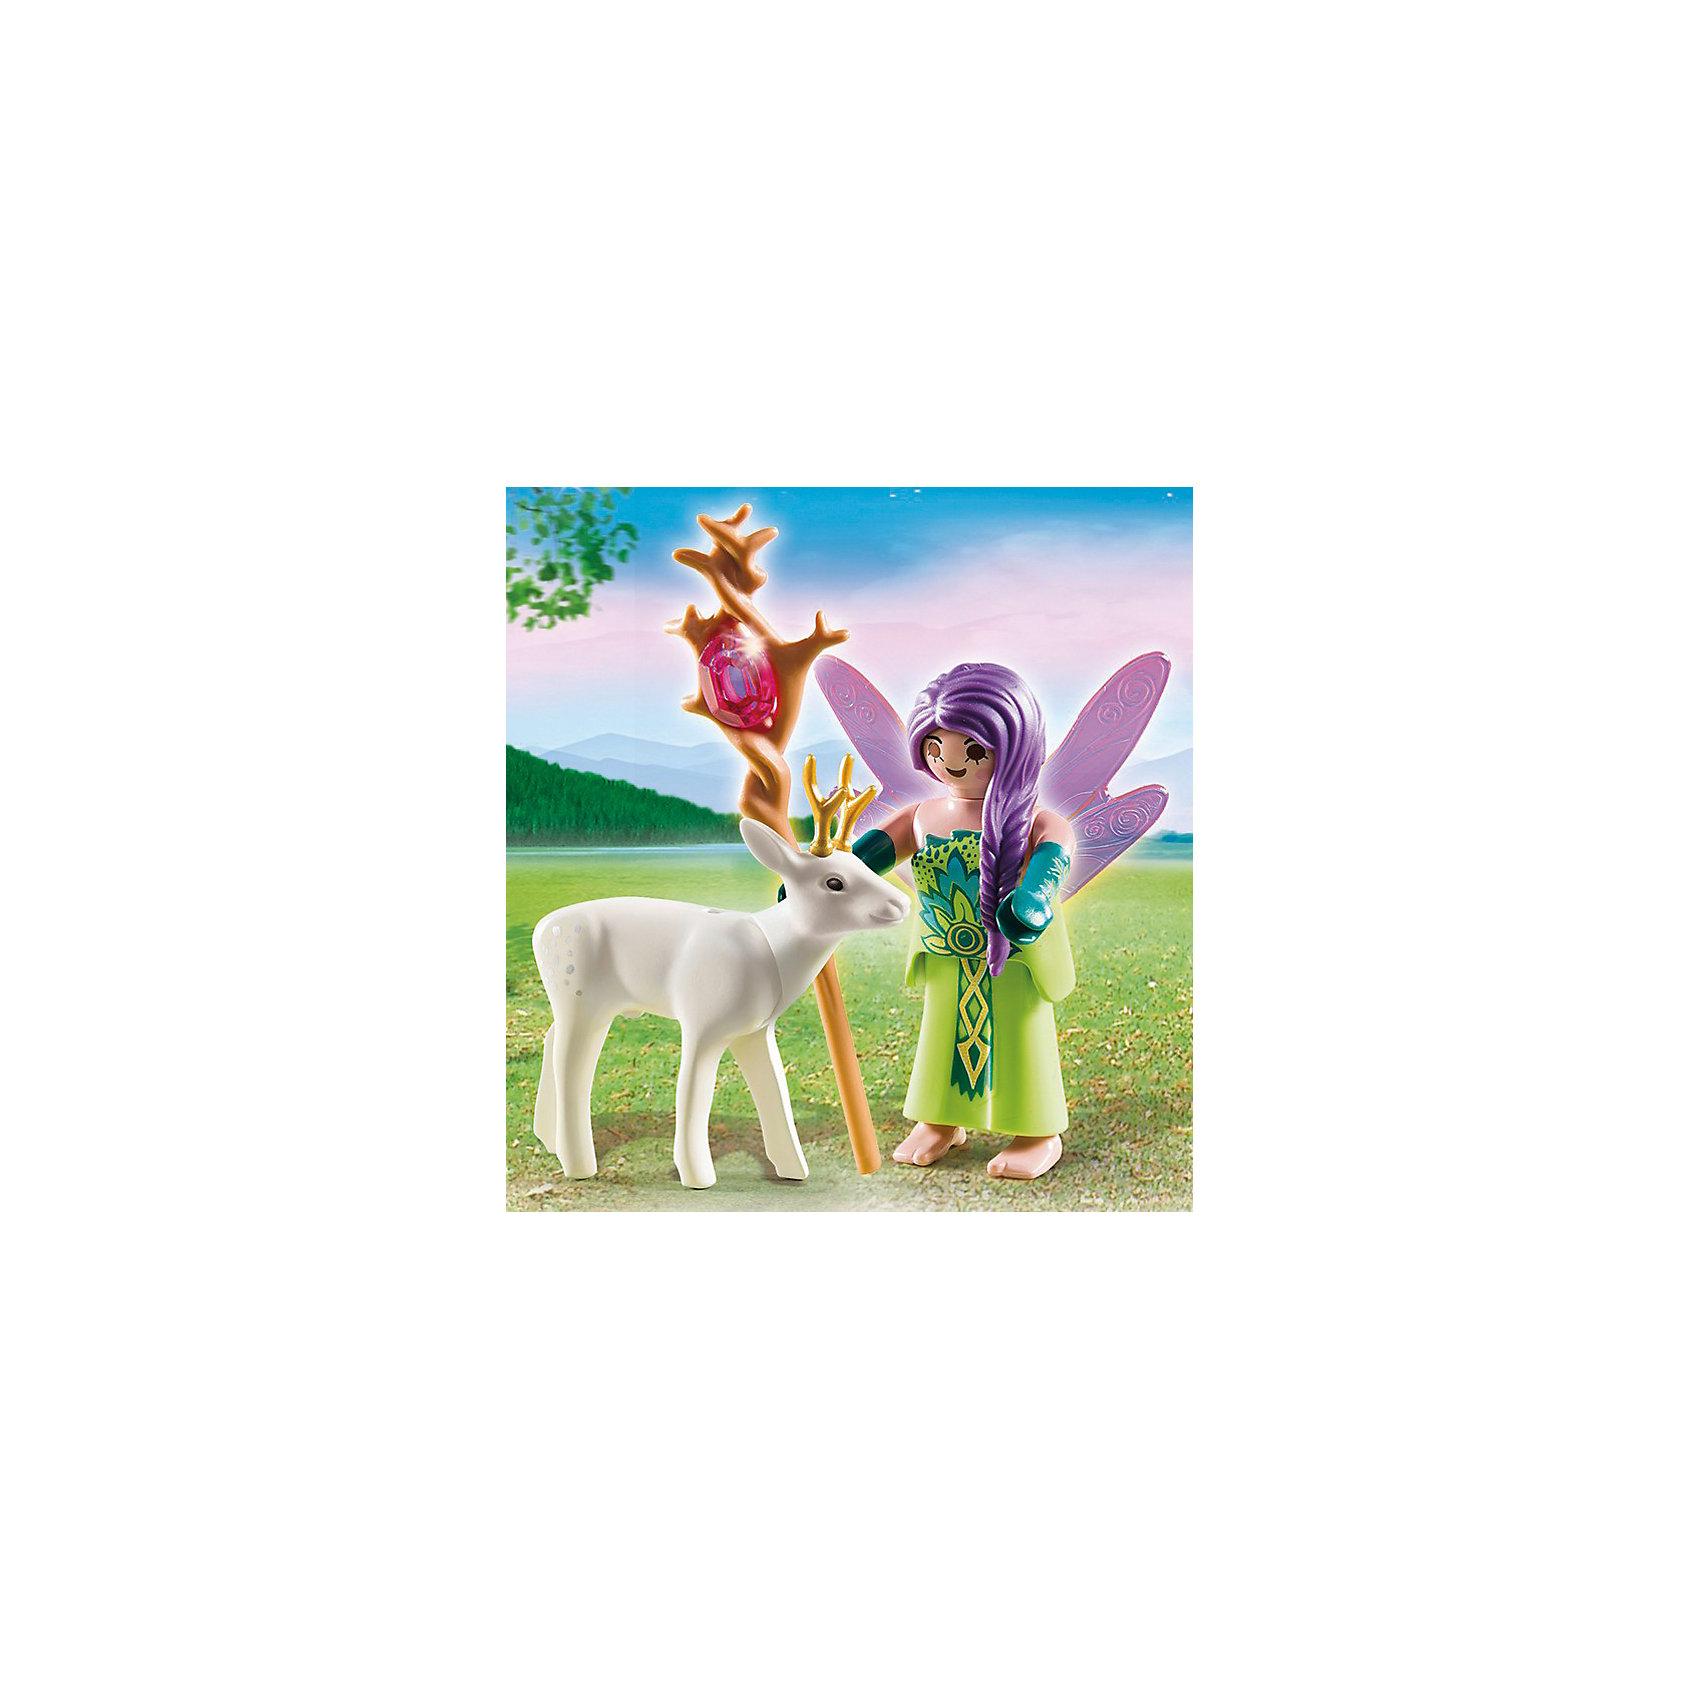 PLAYMOBIL® Экстра-набор: Фея с оленем, PLAYMOBIL playmobil® экстра набор фея с оленем playmobil